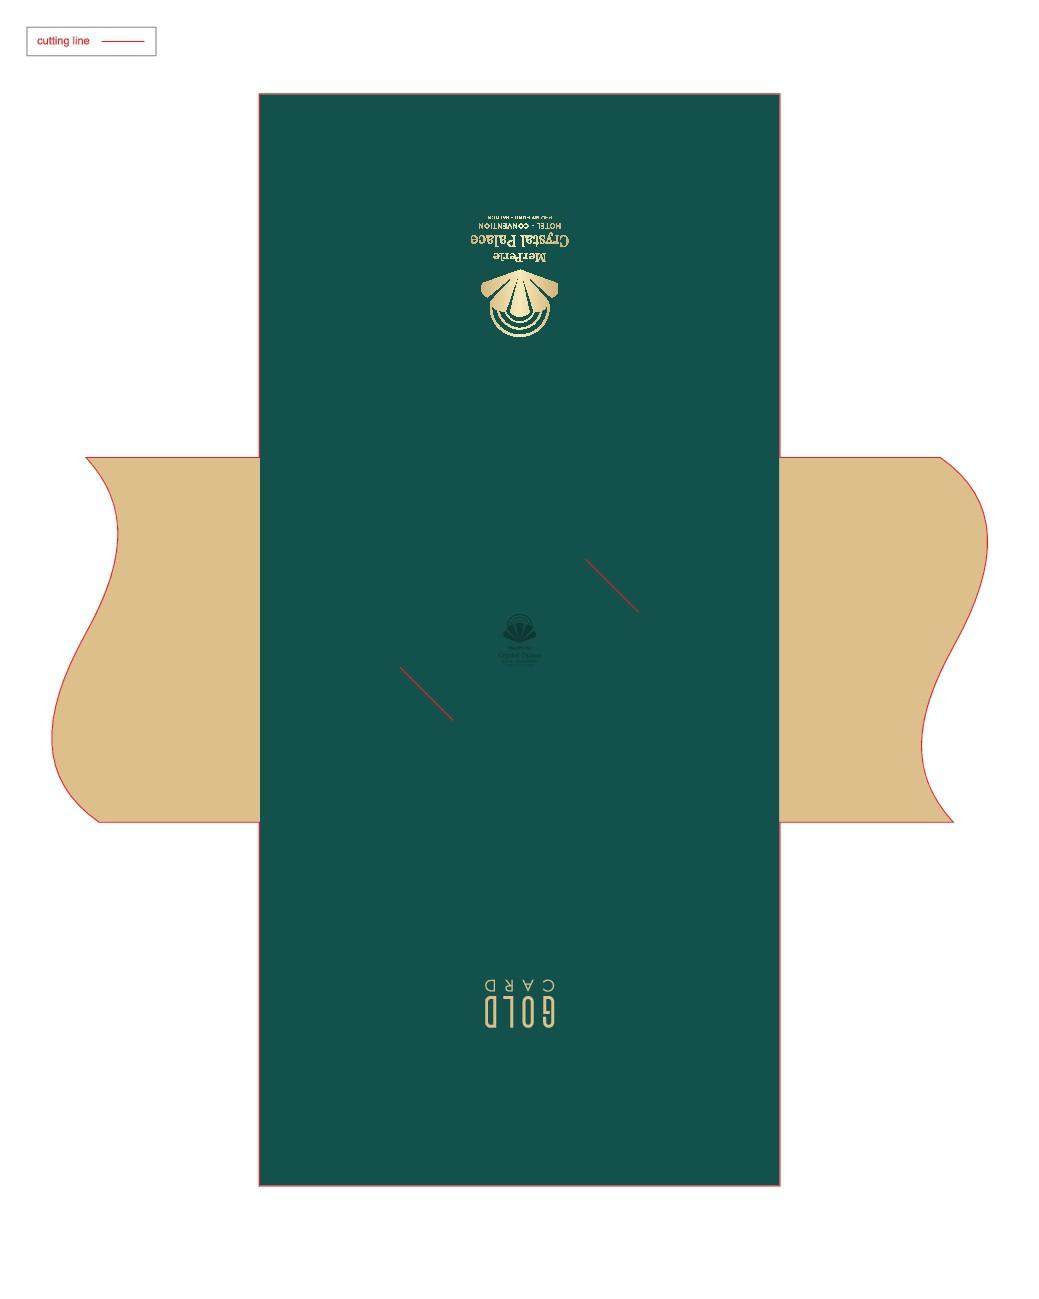 Loyalty Card Packaging design